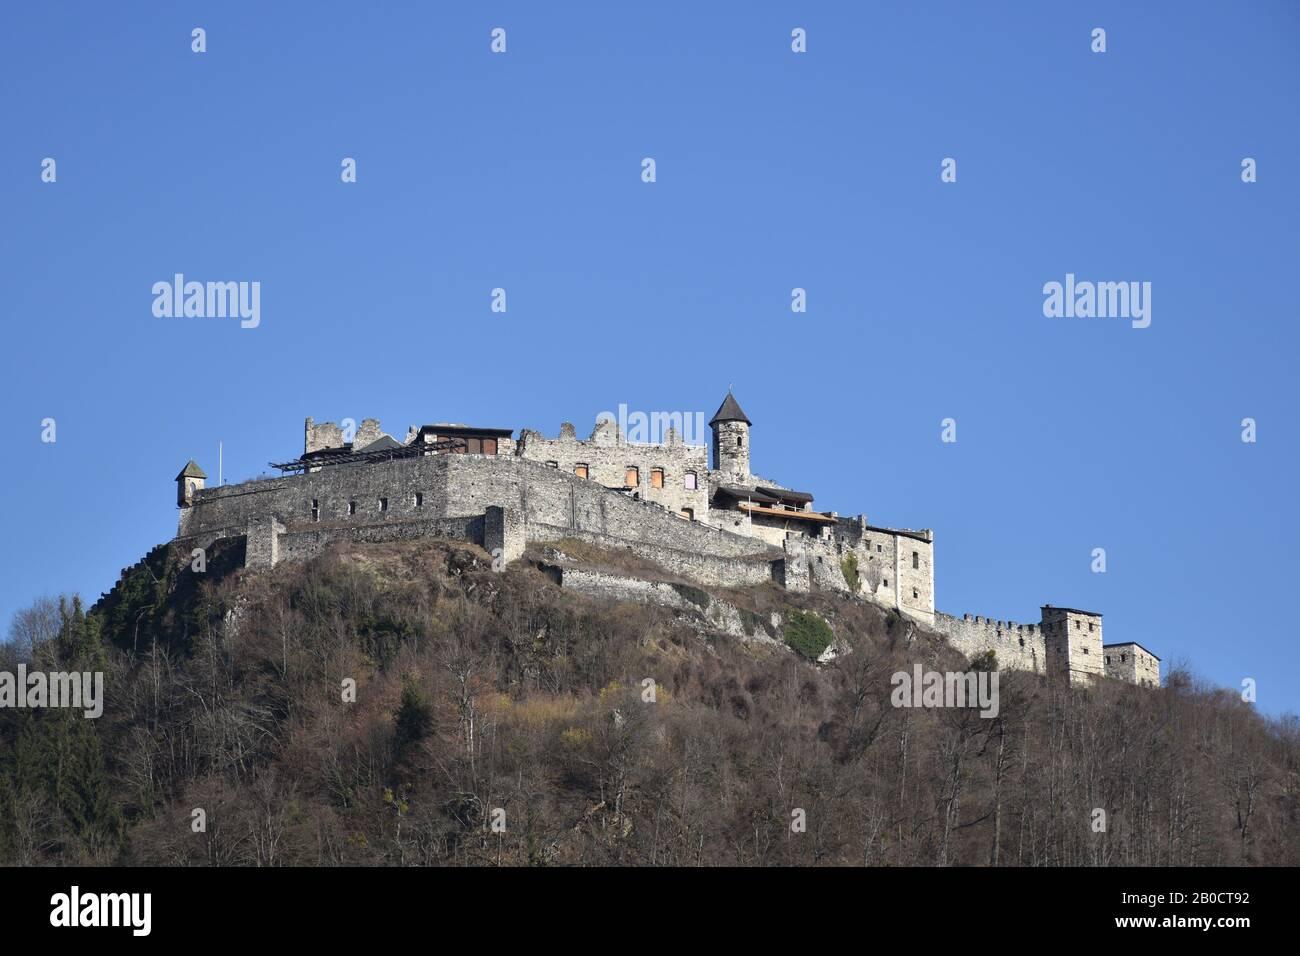 Burg Landskron, Landskron, Kärnten, Villach, Burg, Burgruine, Turm, Festung, Felsenburg, Ossiacher Tauern, Grad Vajškra, Mittelalter, Arena, Höhenburg Foto Stock